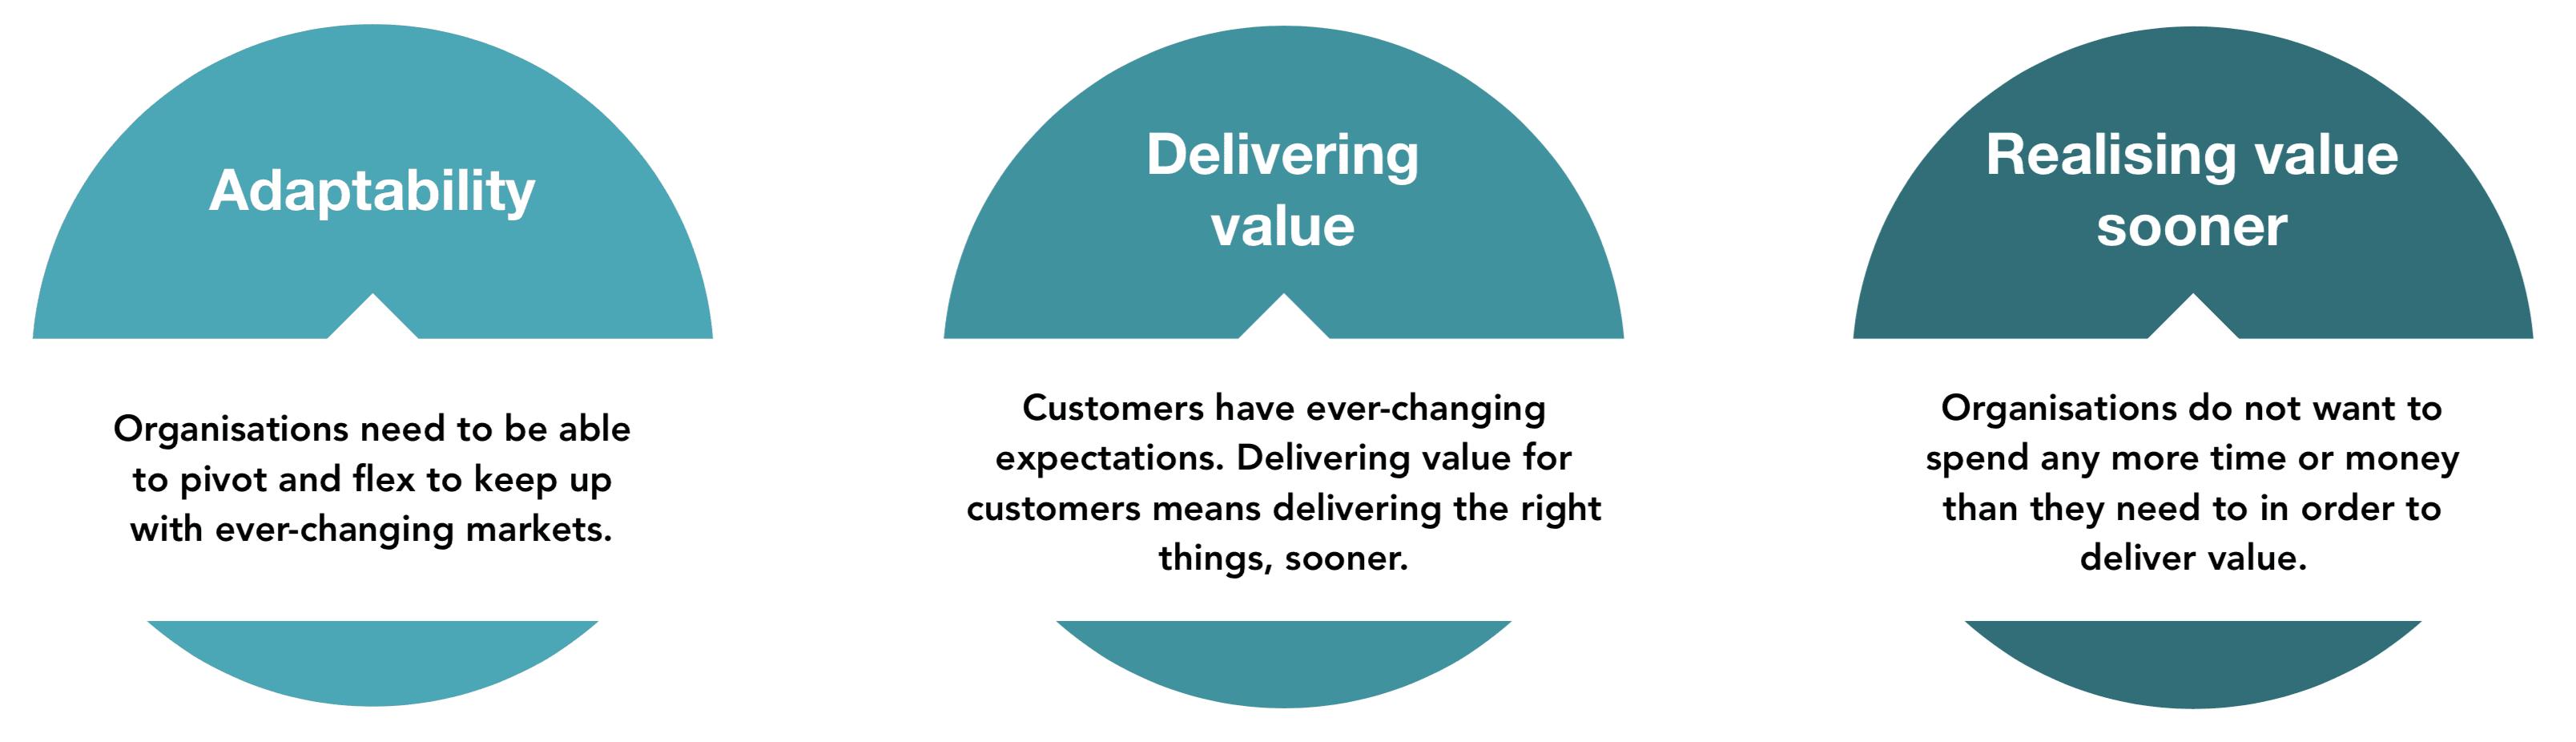 Agile | Adaptability | Delivering Value | Realising Value Sooner